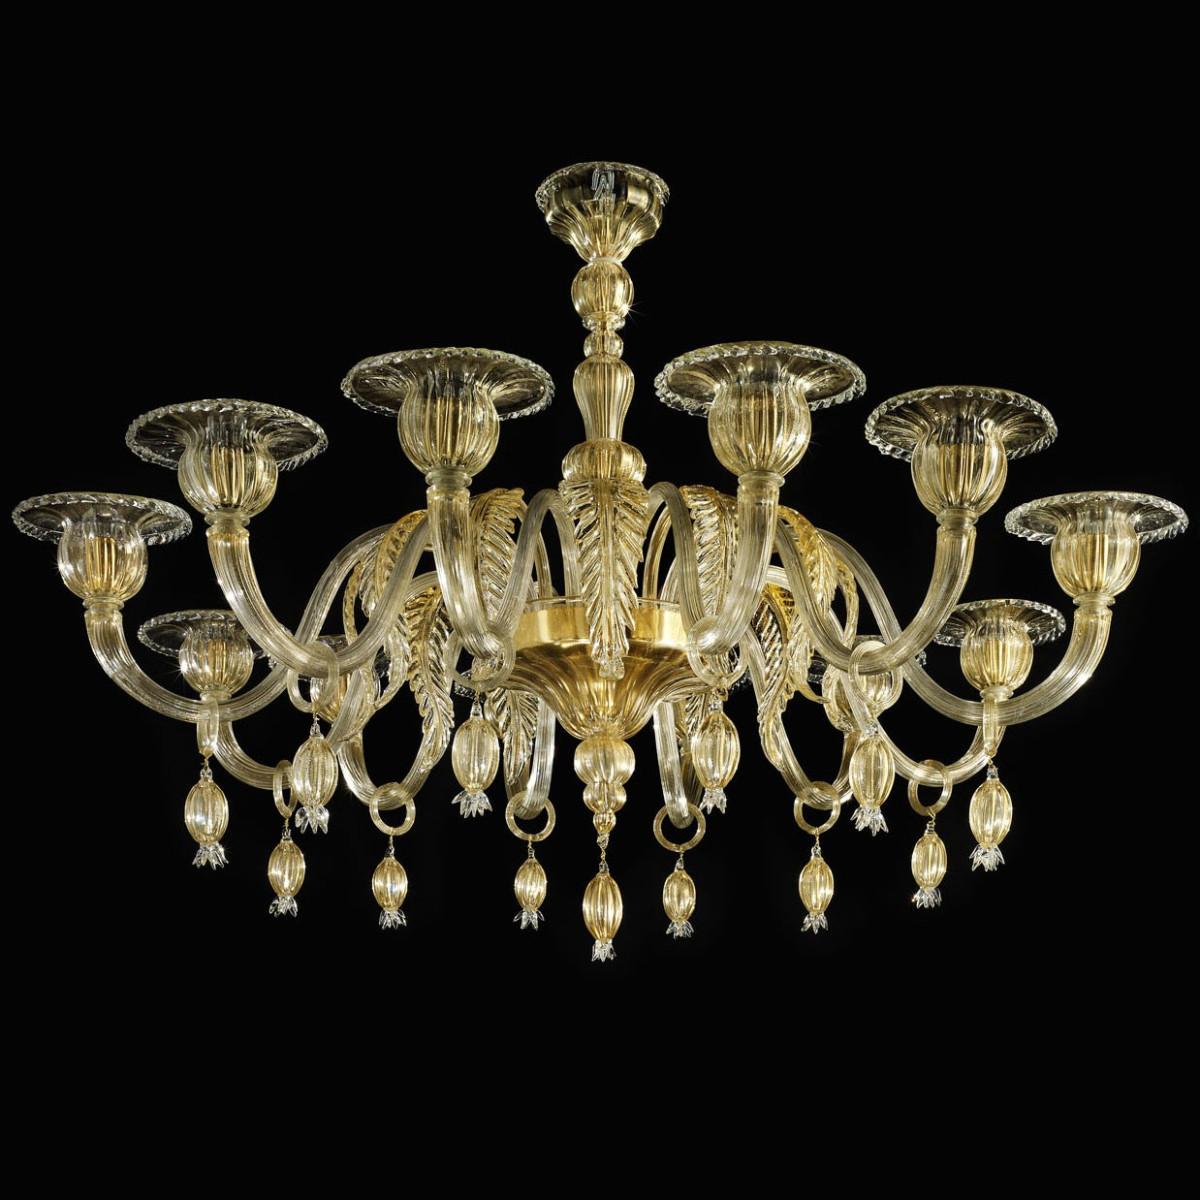 """Orfeo"" lustre en verre de Murano - 12 lumieres - tout or"